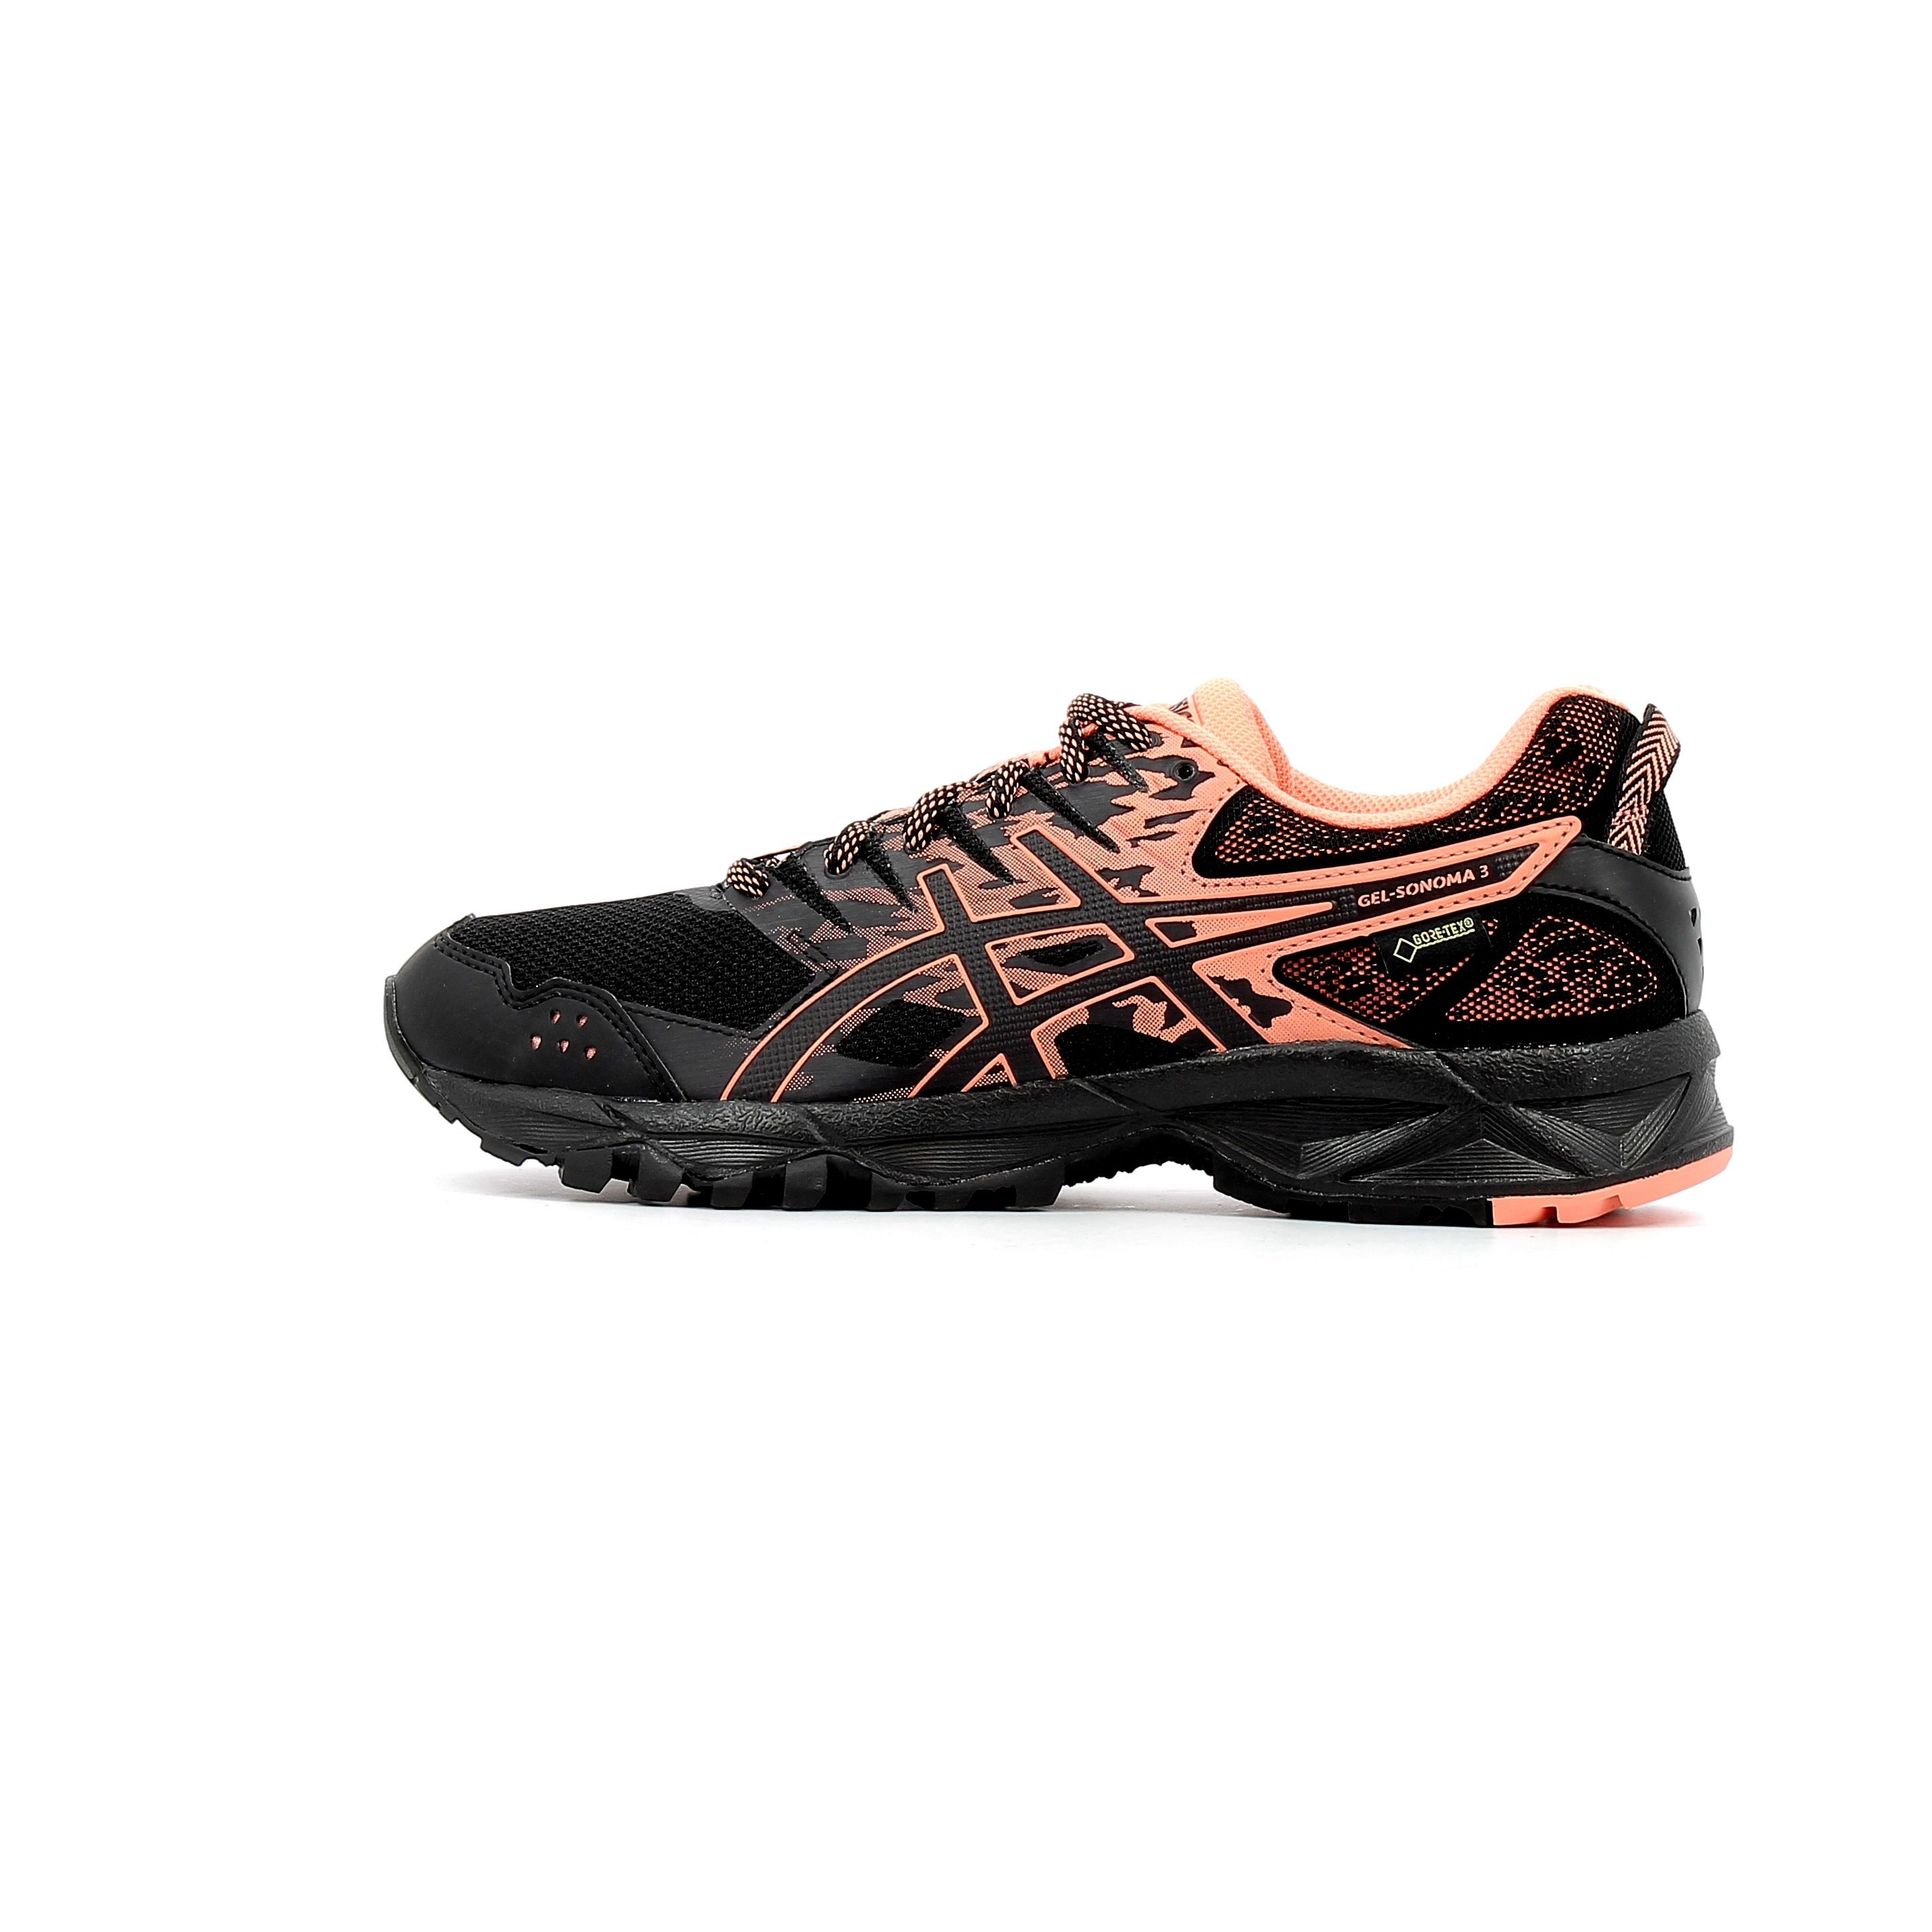 Gore Tex 3 Chaussure De Asics Sonoma Women Trail Gel jSMpGLqUzV